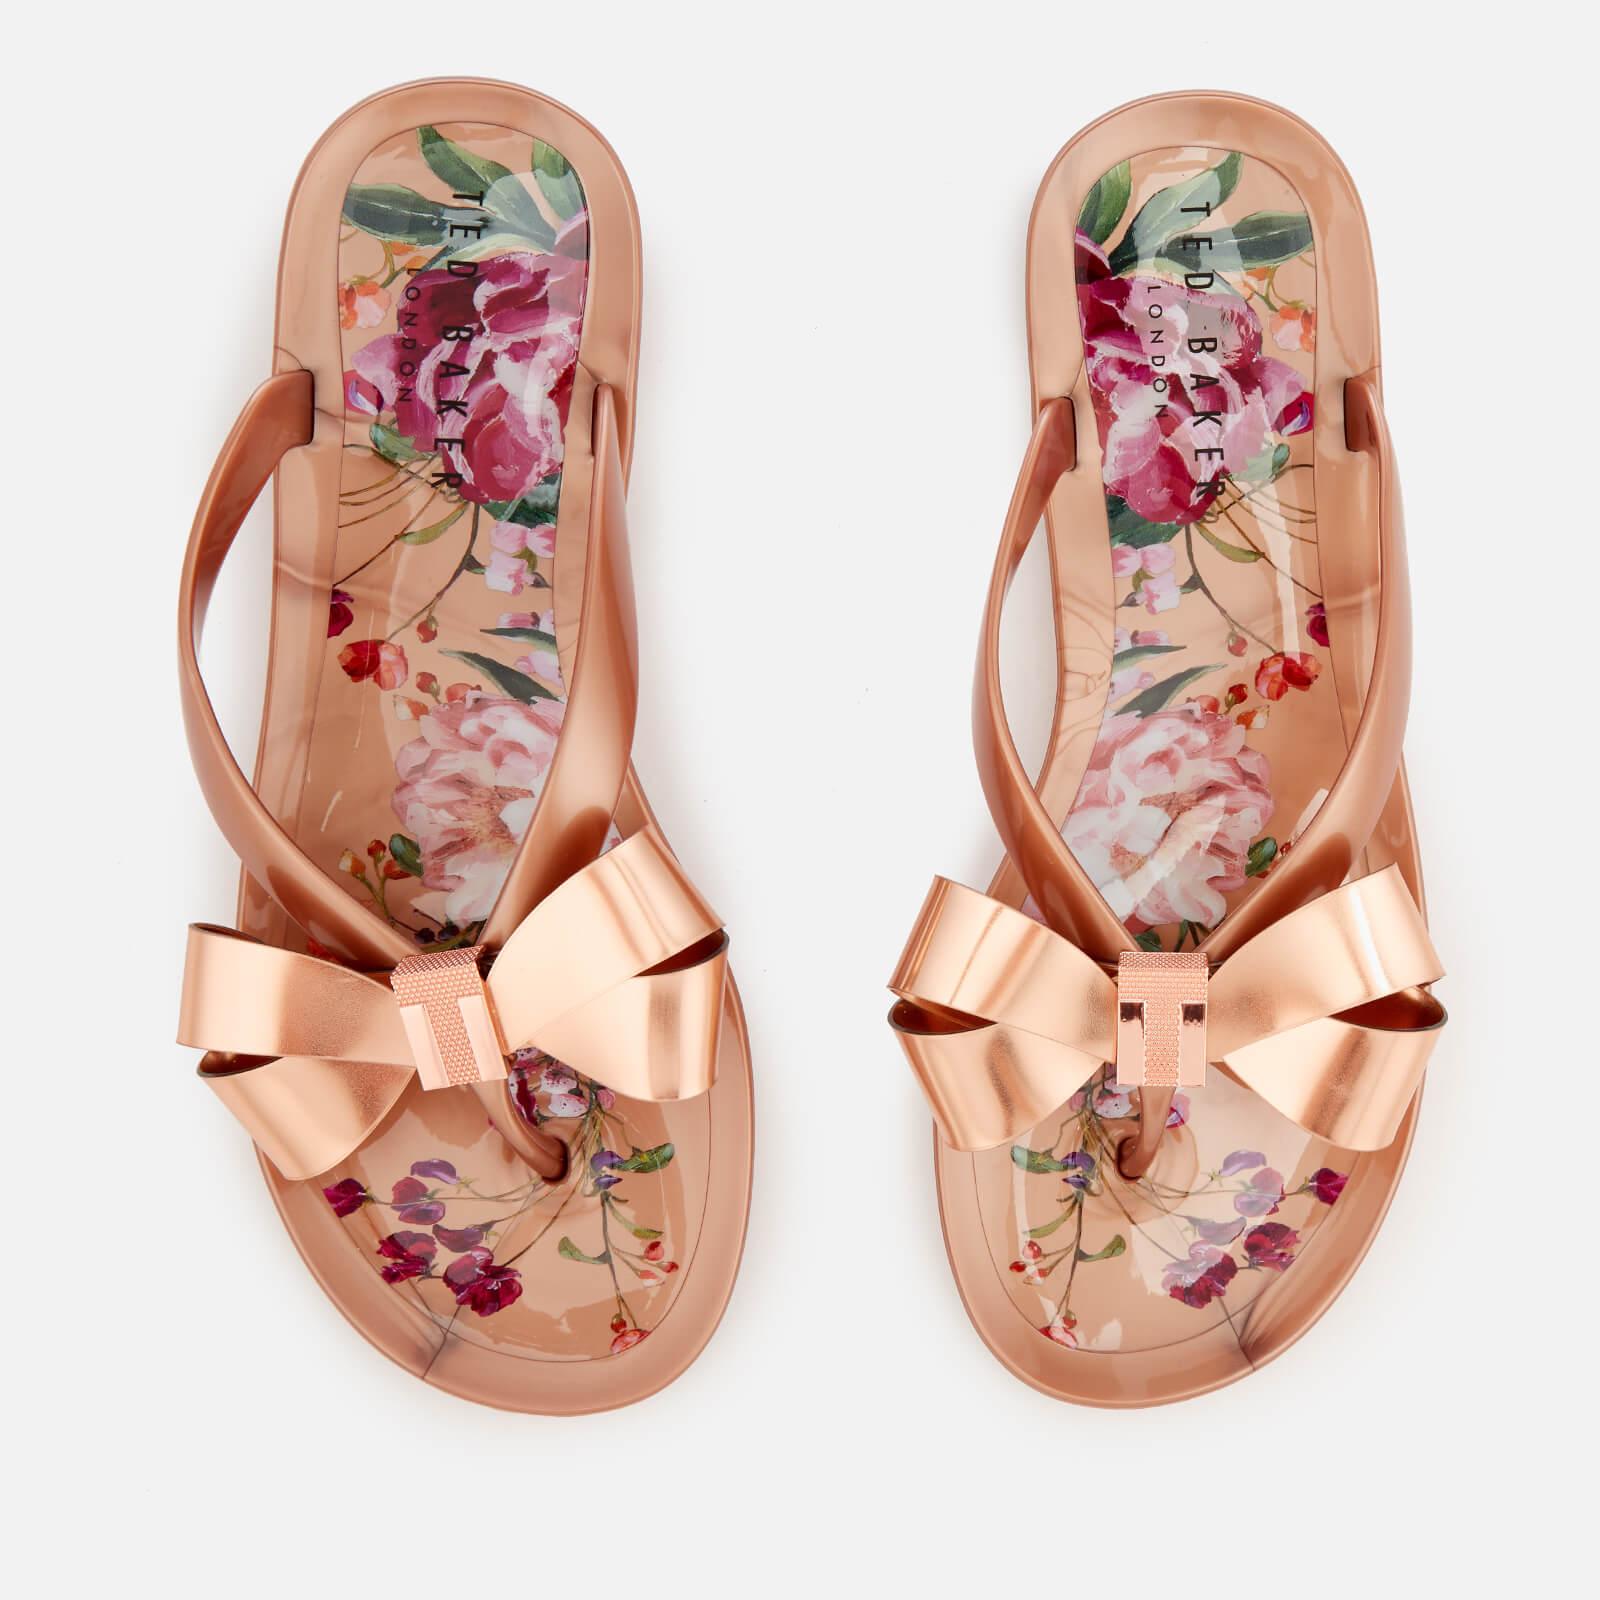 cbfe18a34 Ted Baker Women s Susziep Bow Flip Flops - Serenity Rose Gold